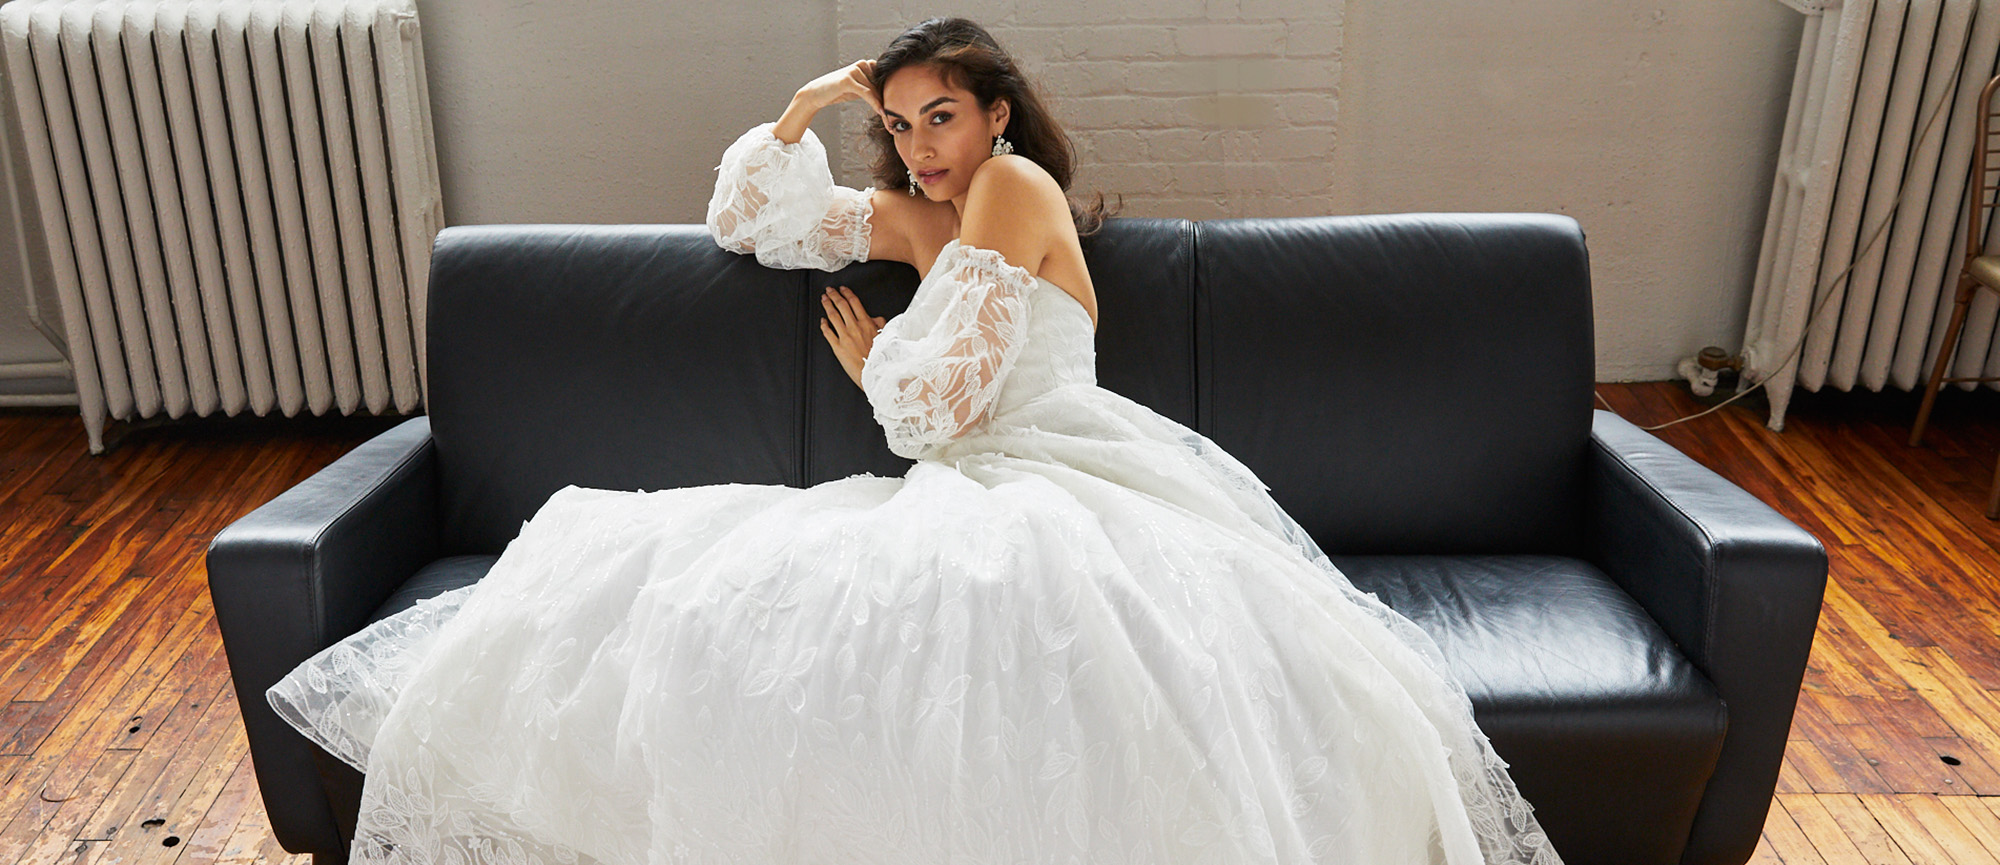 Lyric gown